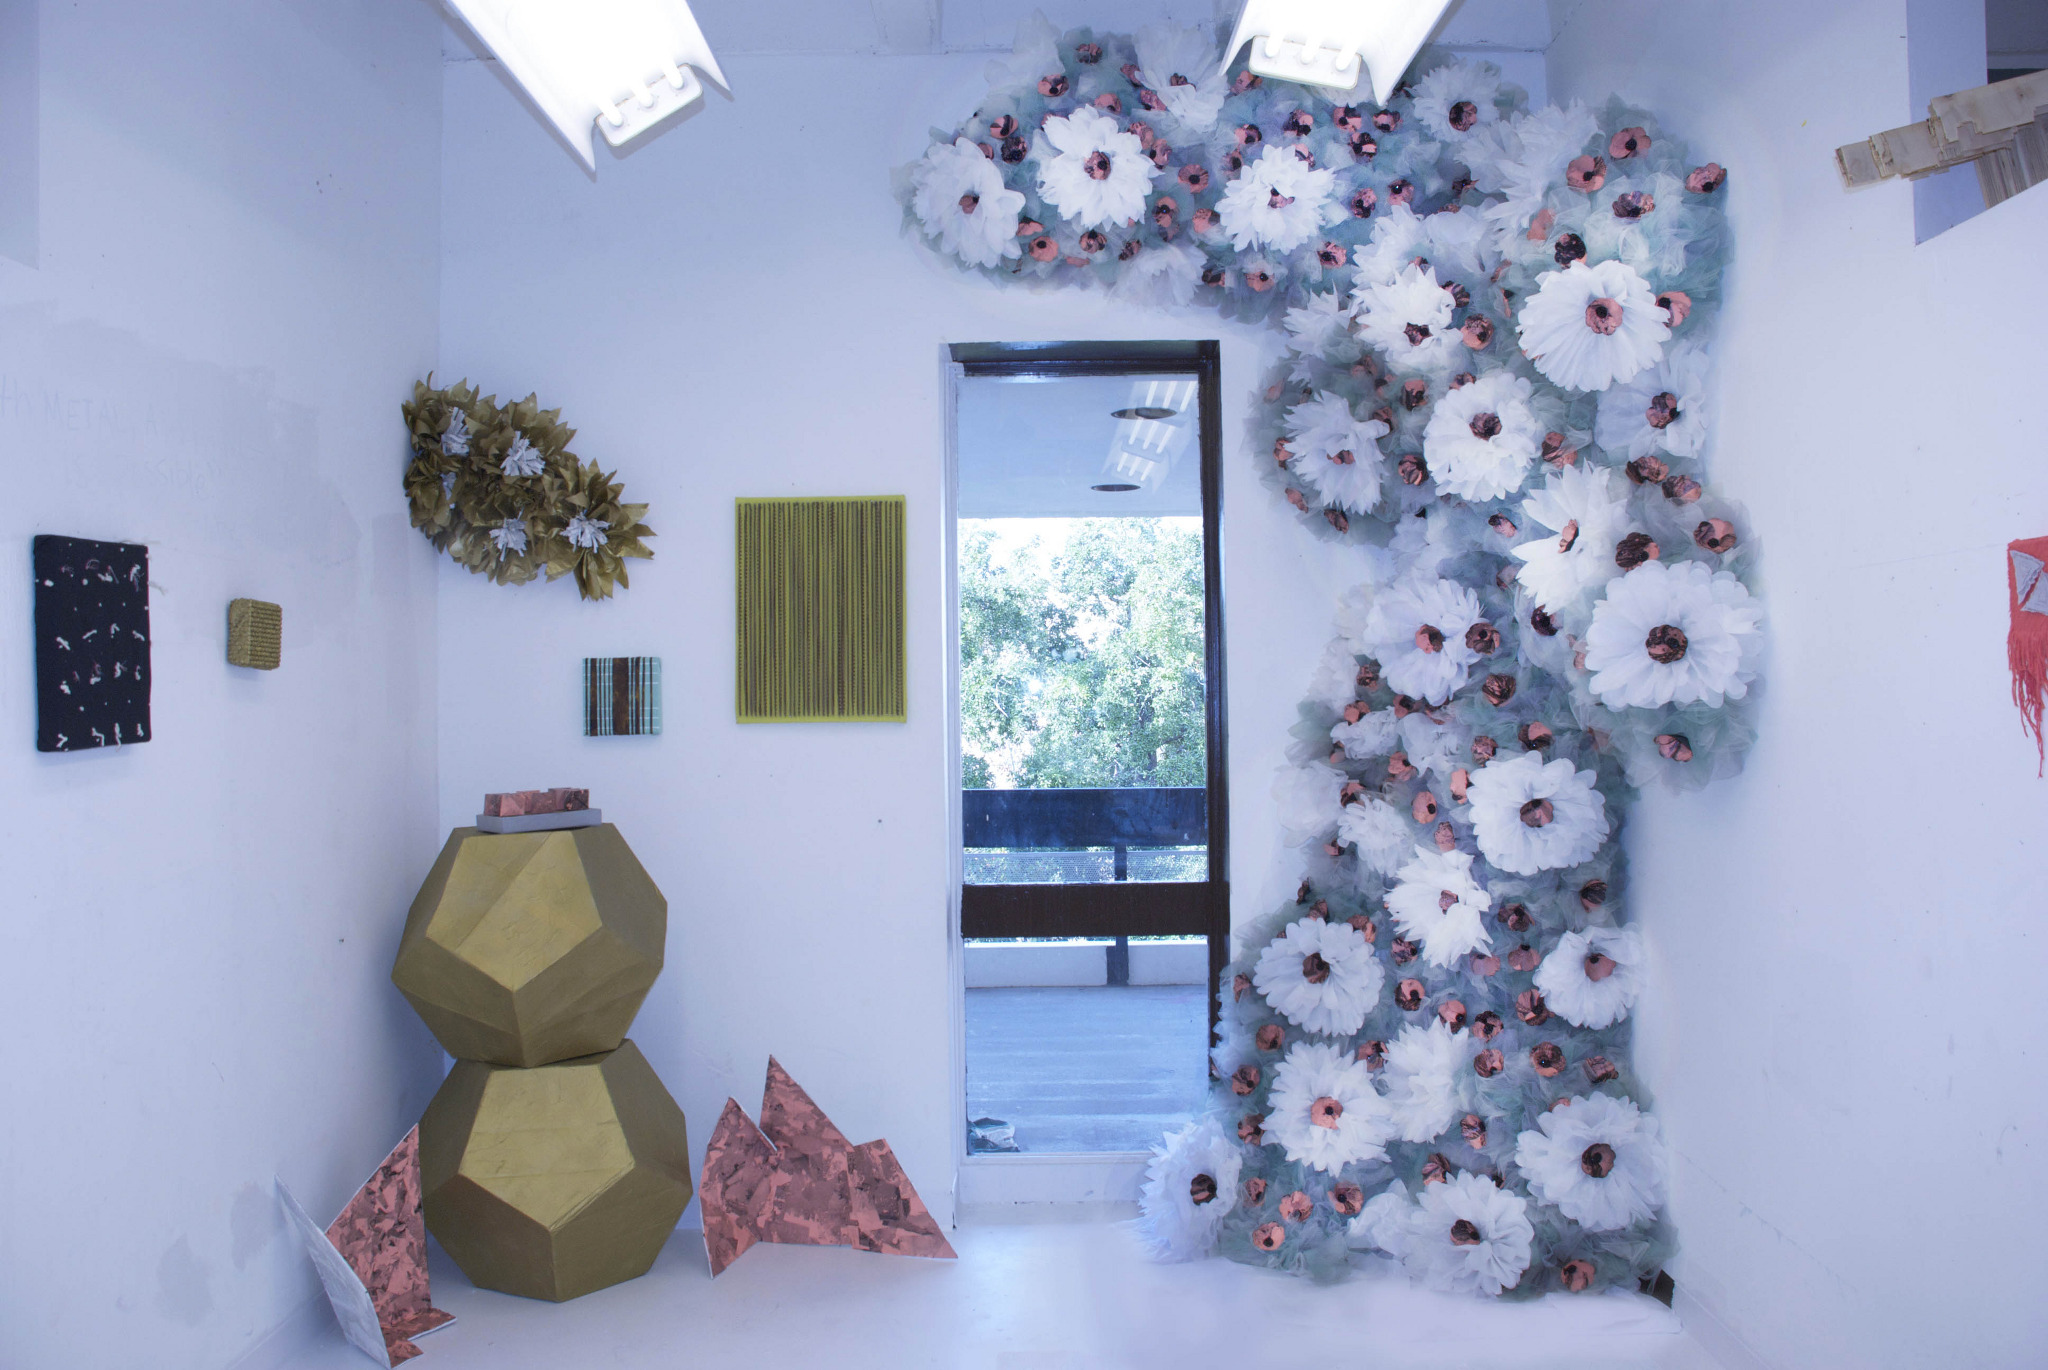 floral installation studio view_o.jpg